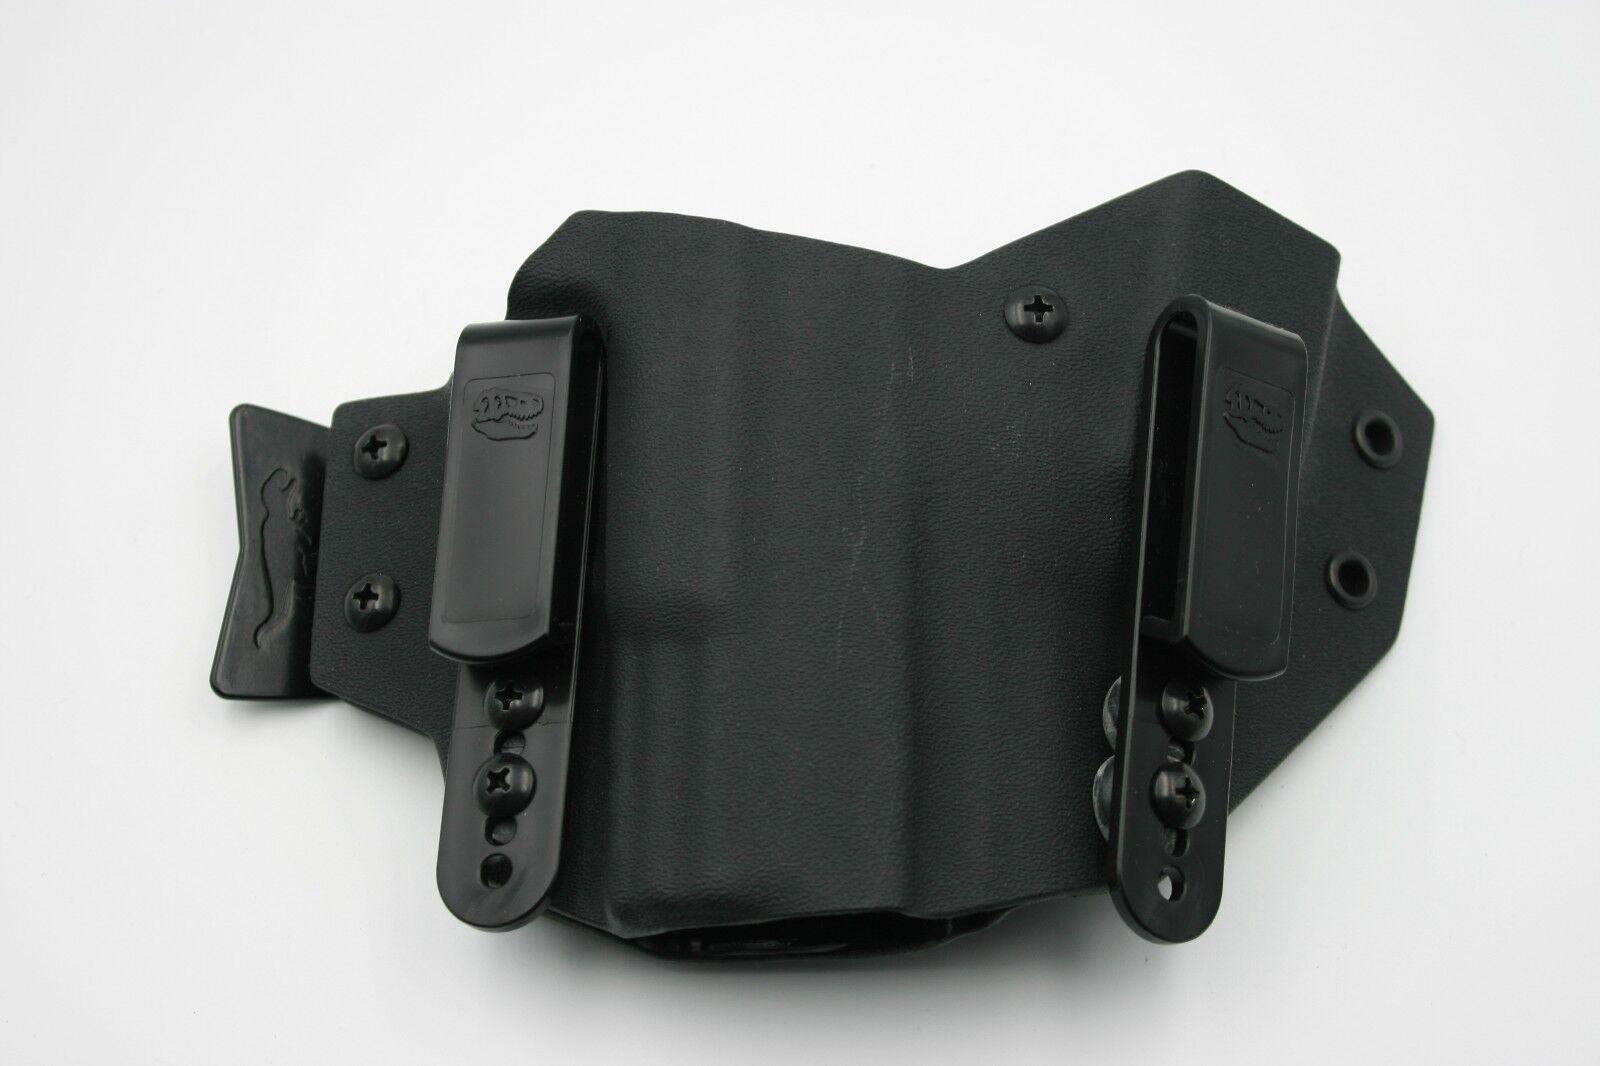 T. Rex Arms XDM 3.8  Sidecar apéndice Rig KYDEX Funda  nuevo